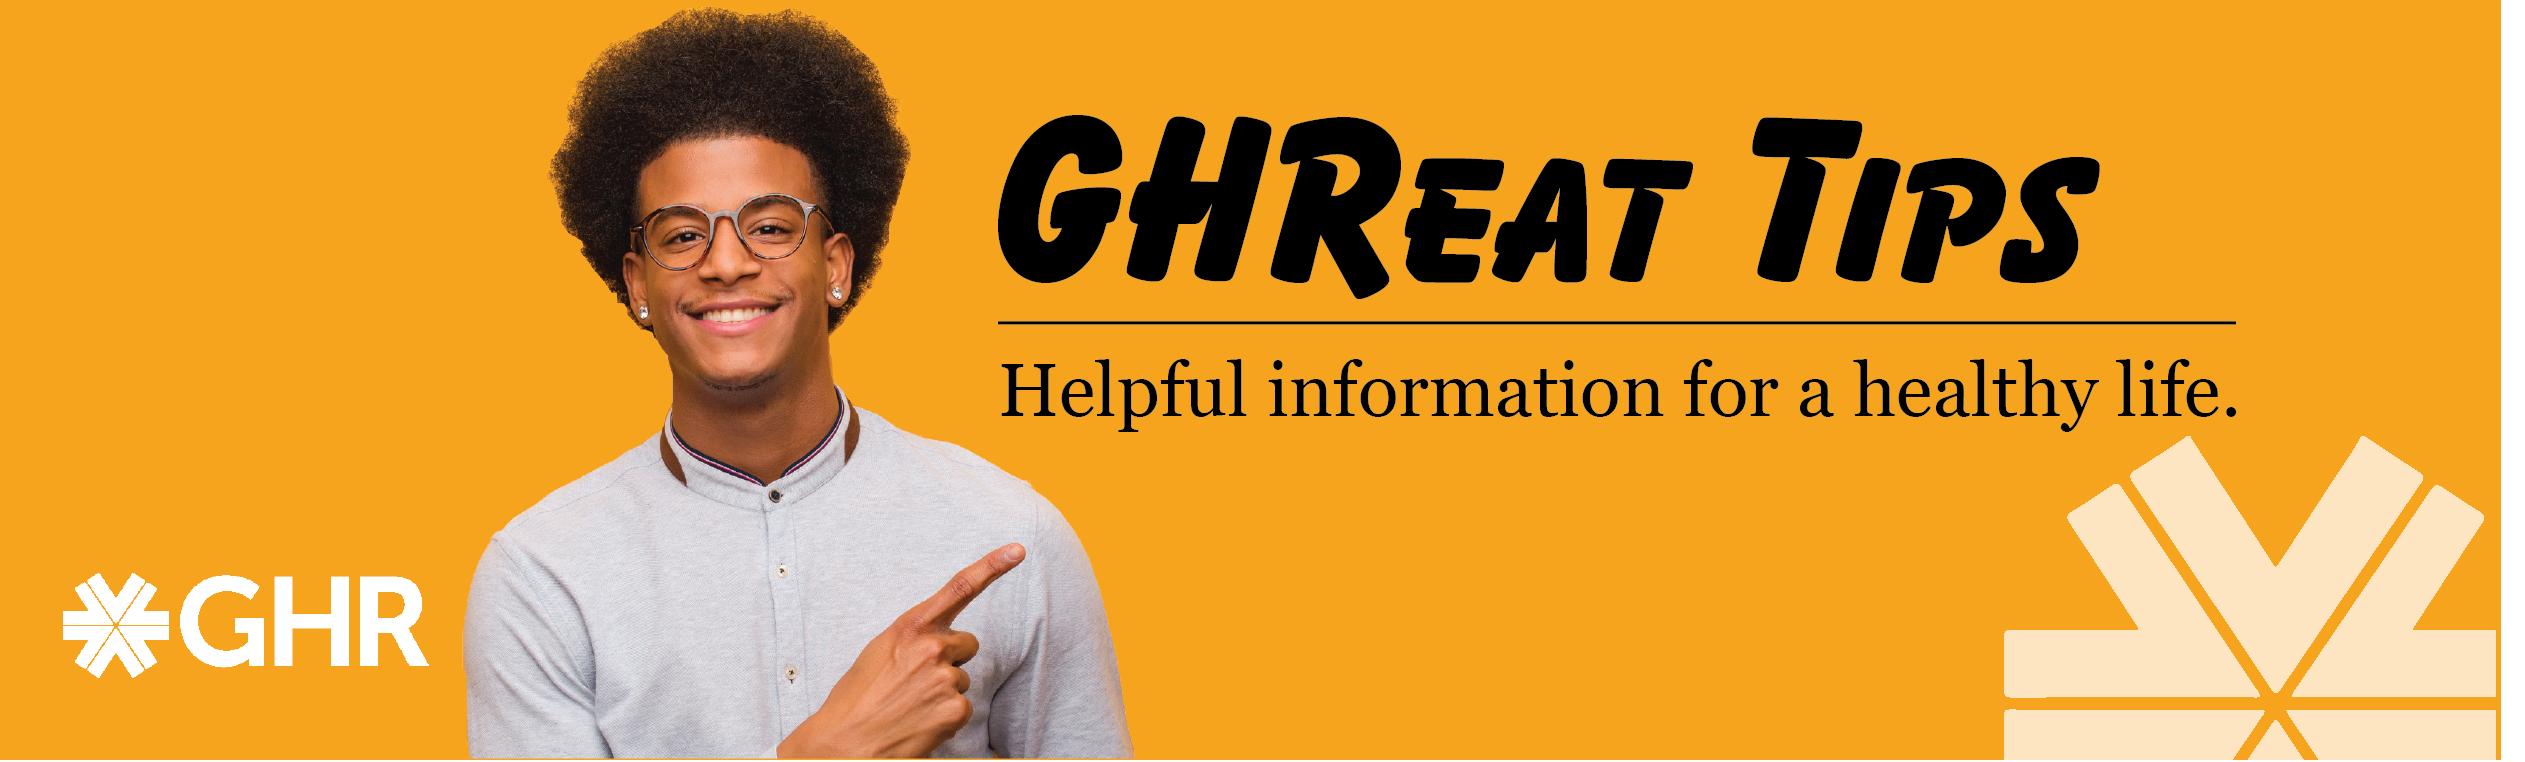 GHReat Tips Masthead 4